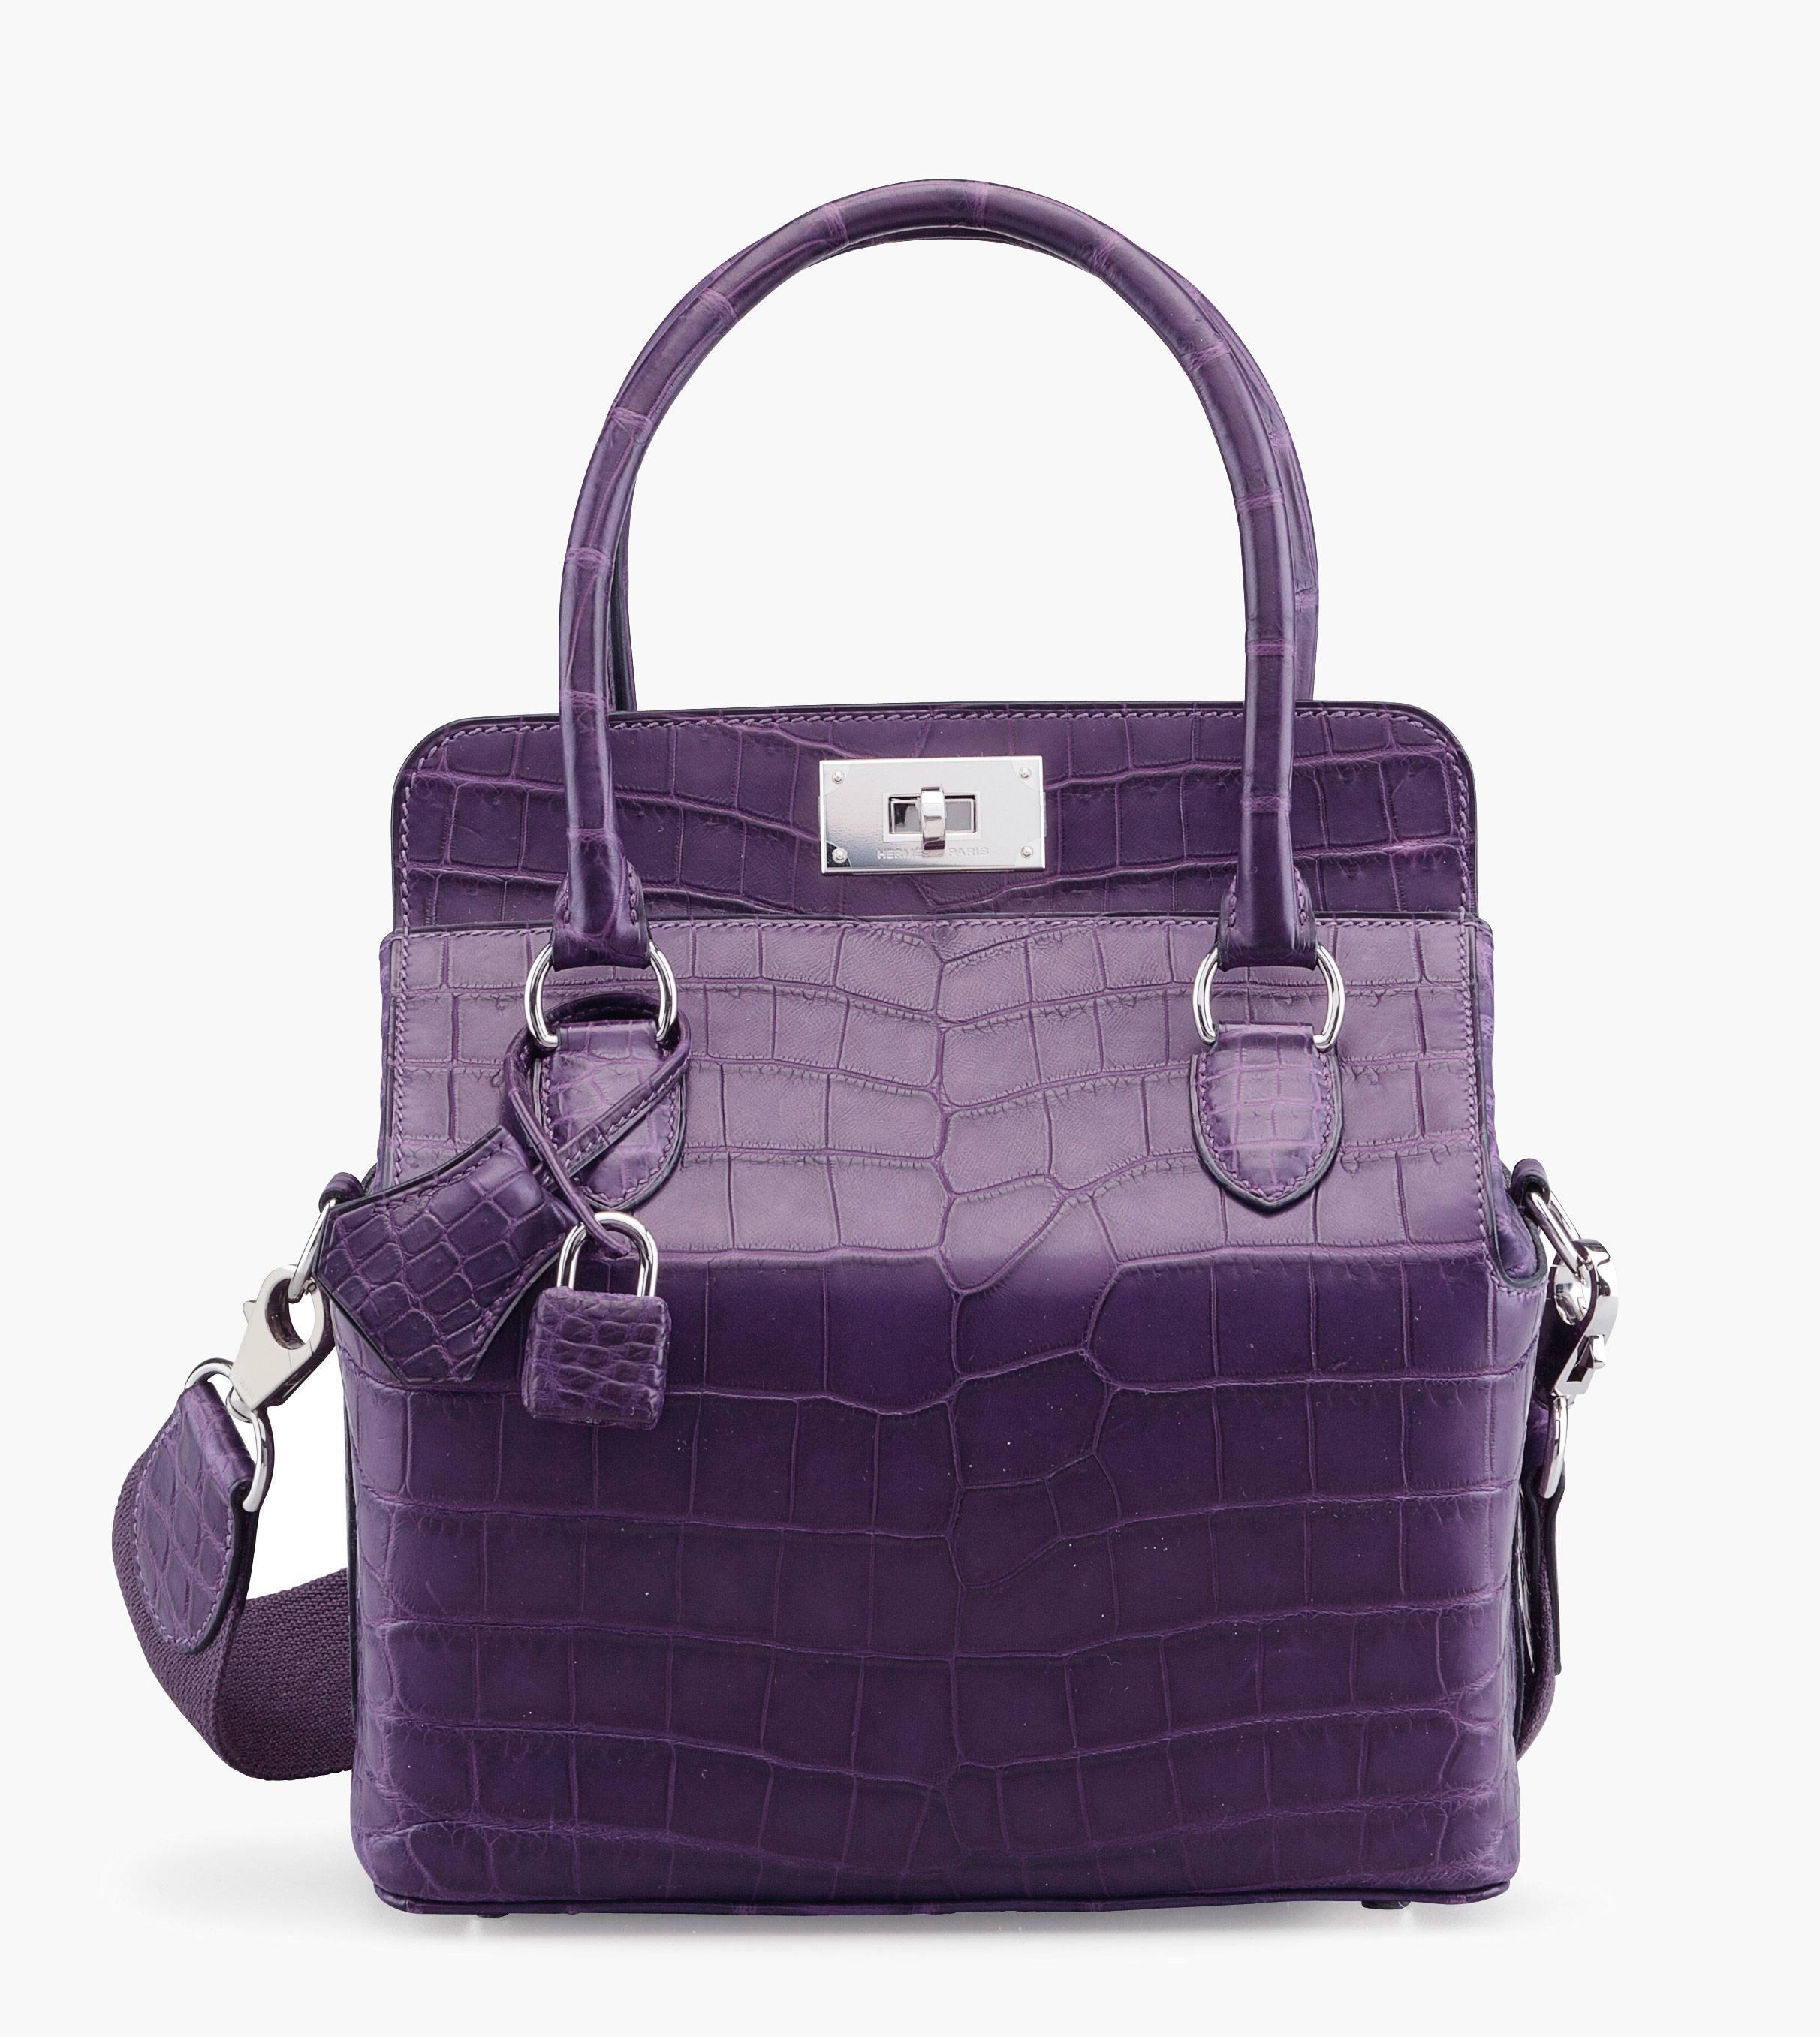 hermes handbag 2013 2014